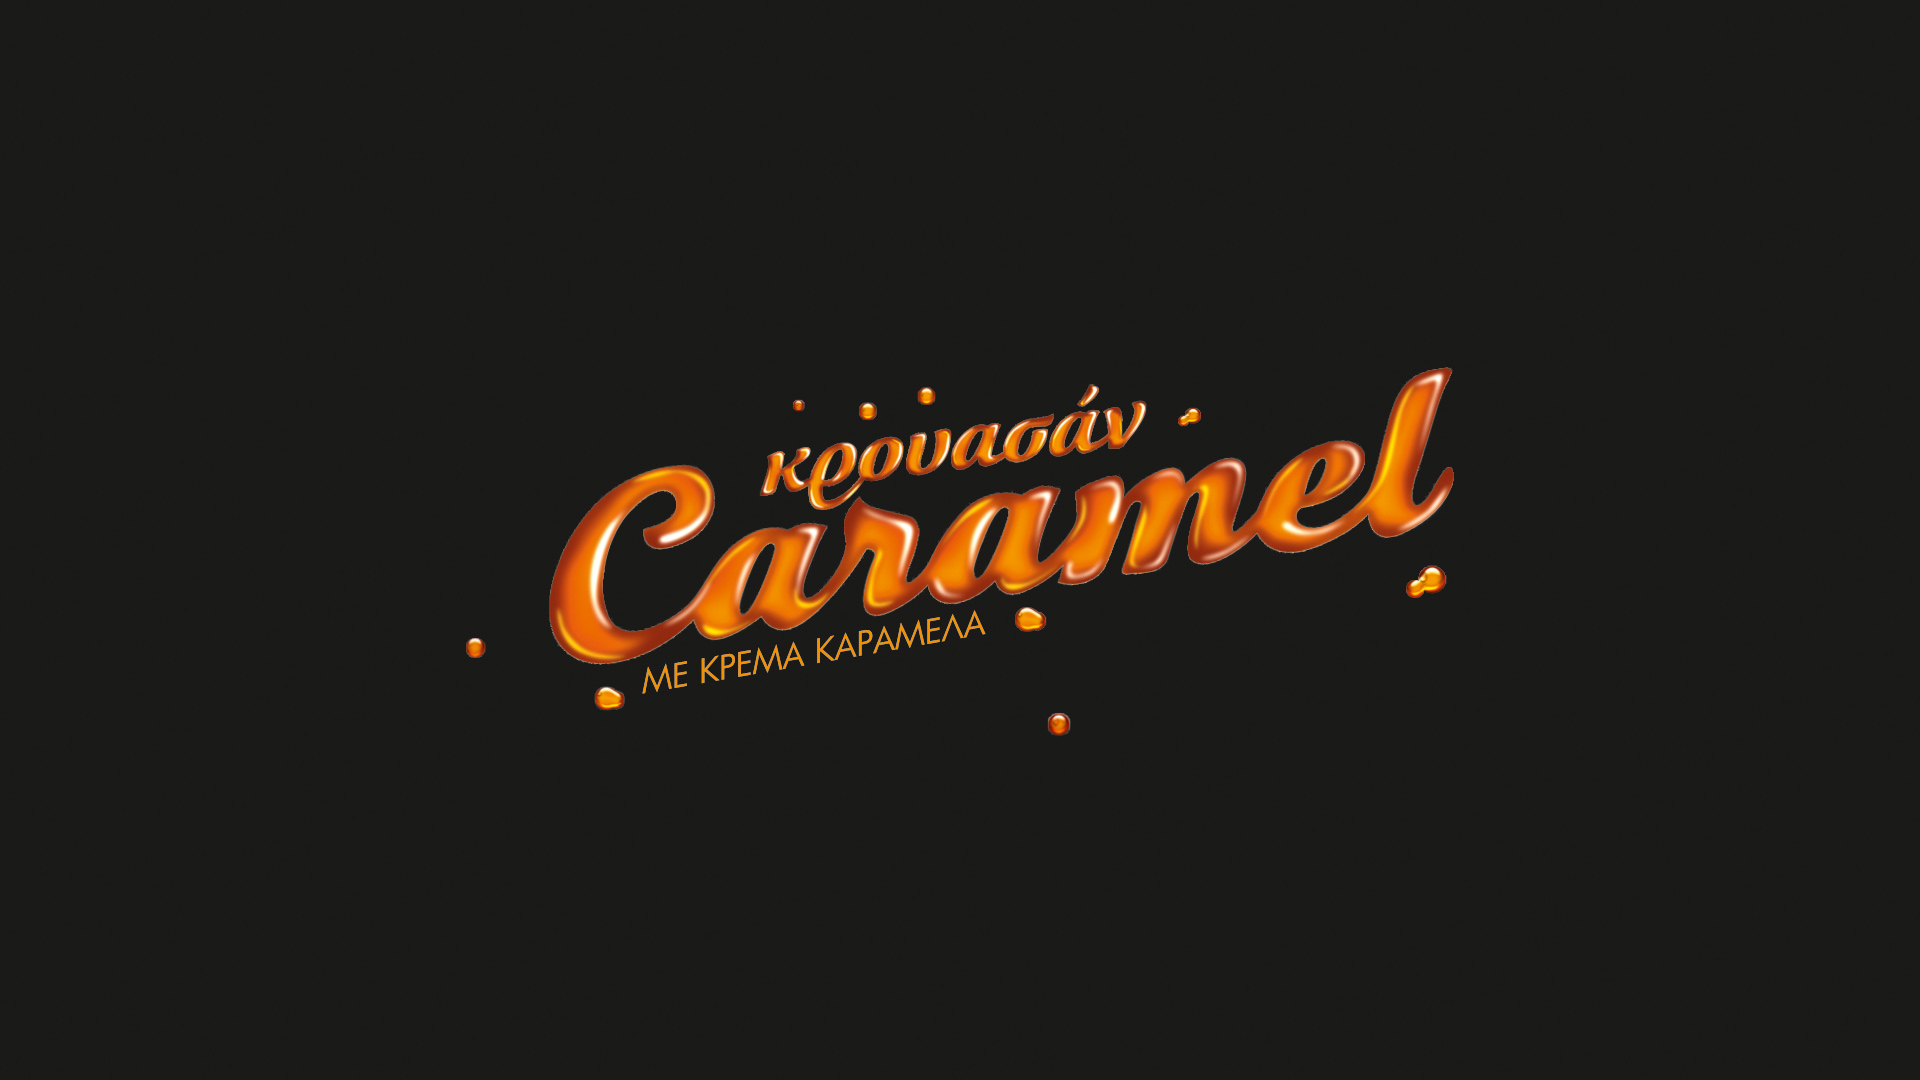 Freshsnack Croissant Caramel